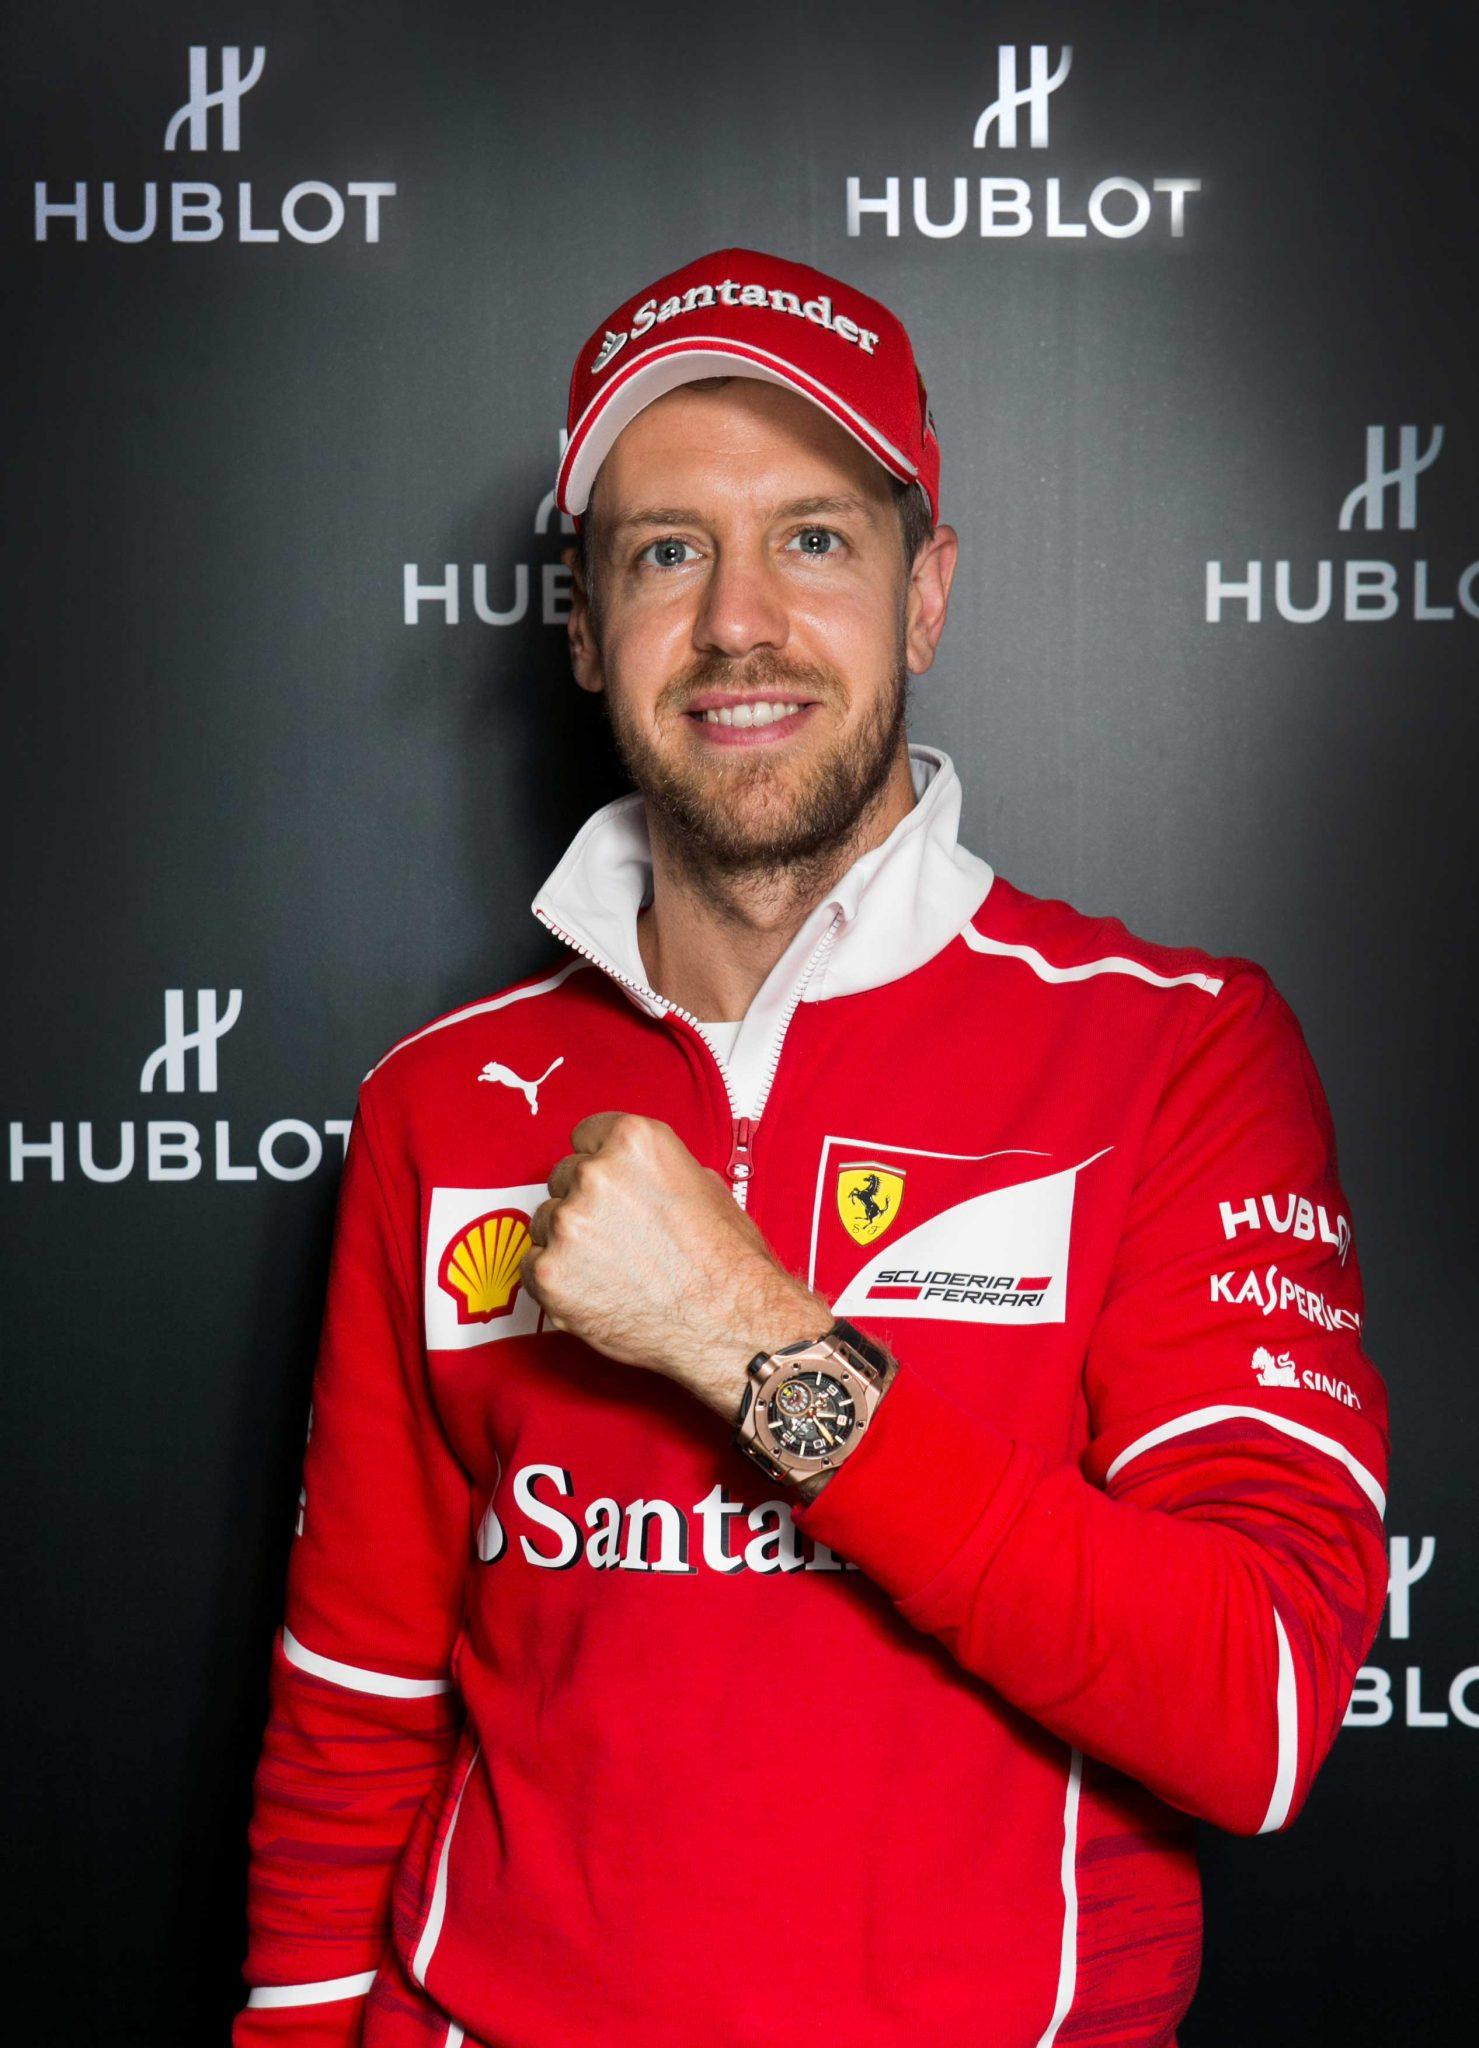 Sebastian Vettel At The Reopening Of Hublot Shanghai HD Style Wallpapers Download free beautiful images and photos HD [prarshipsa.tk]